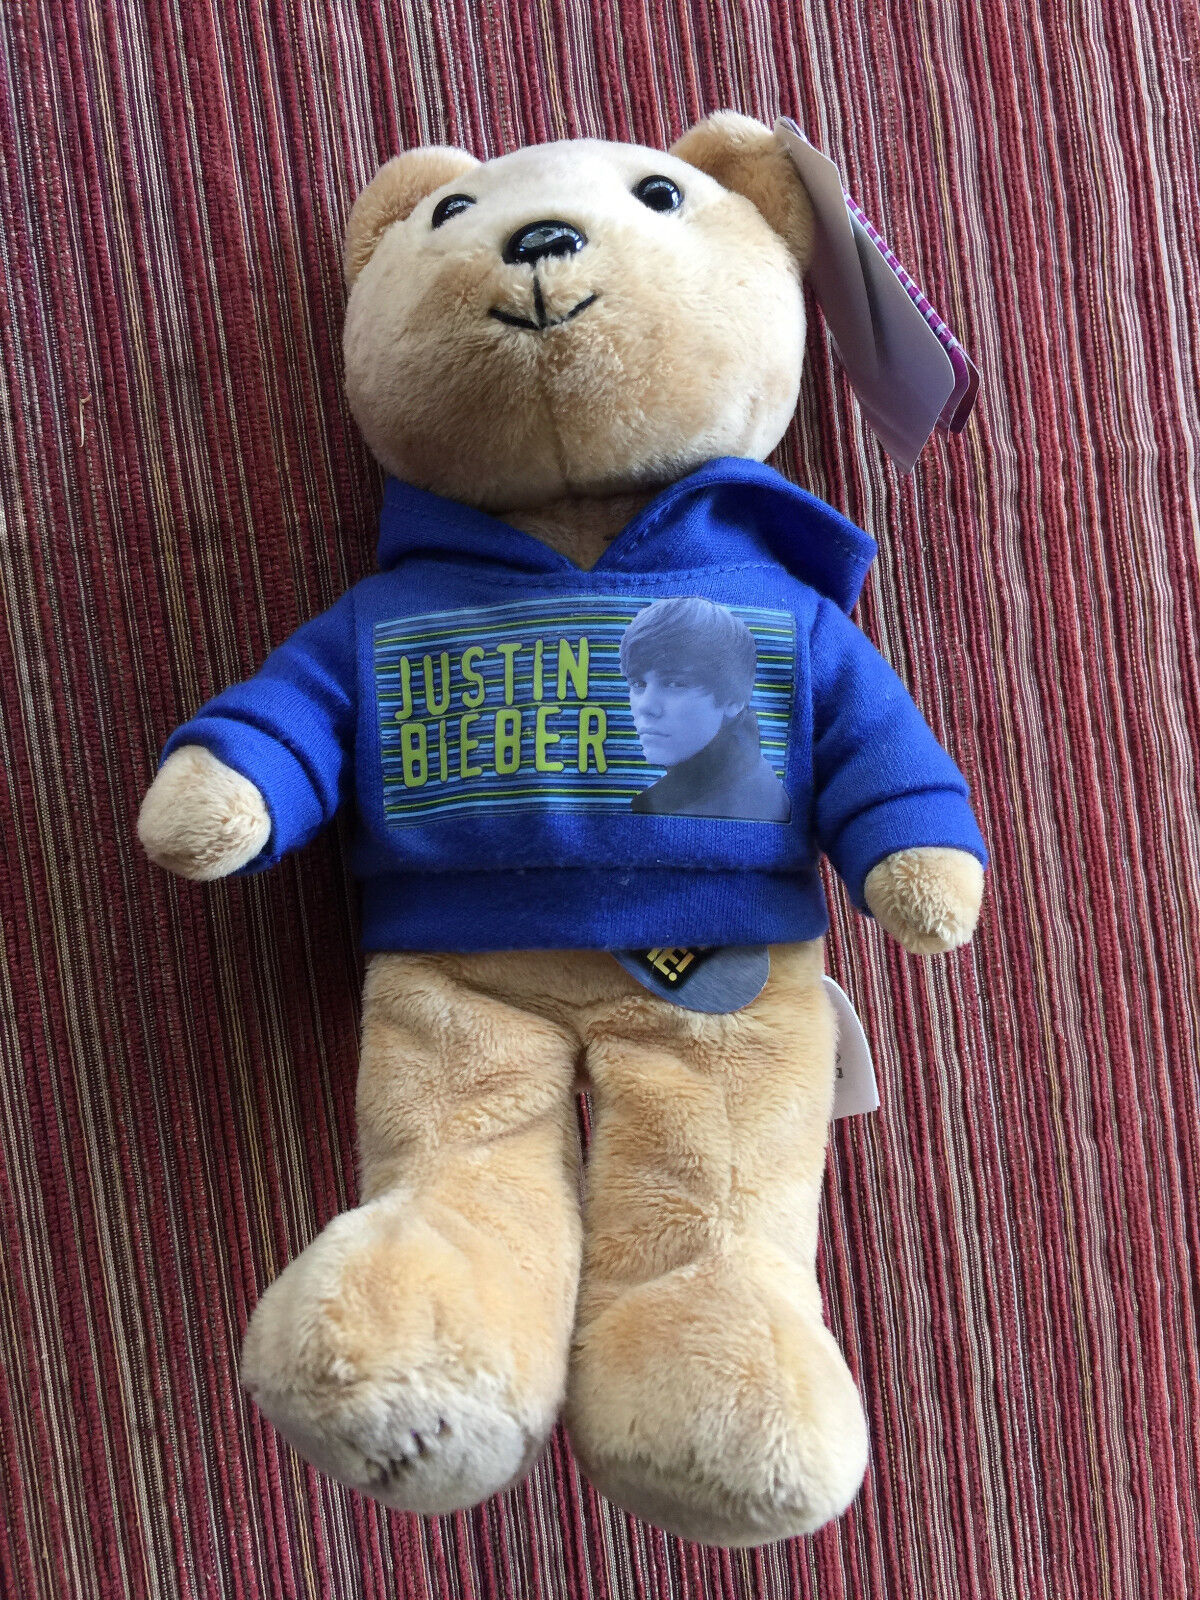 Justin Bieber Collectible Bear SInging Musical Plush Stuffed Concert Souvenir